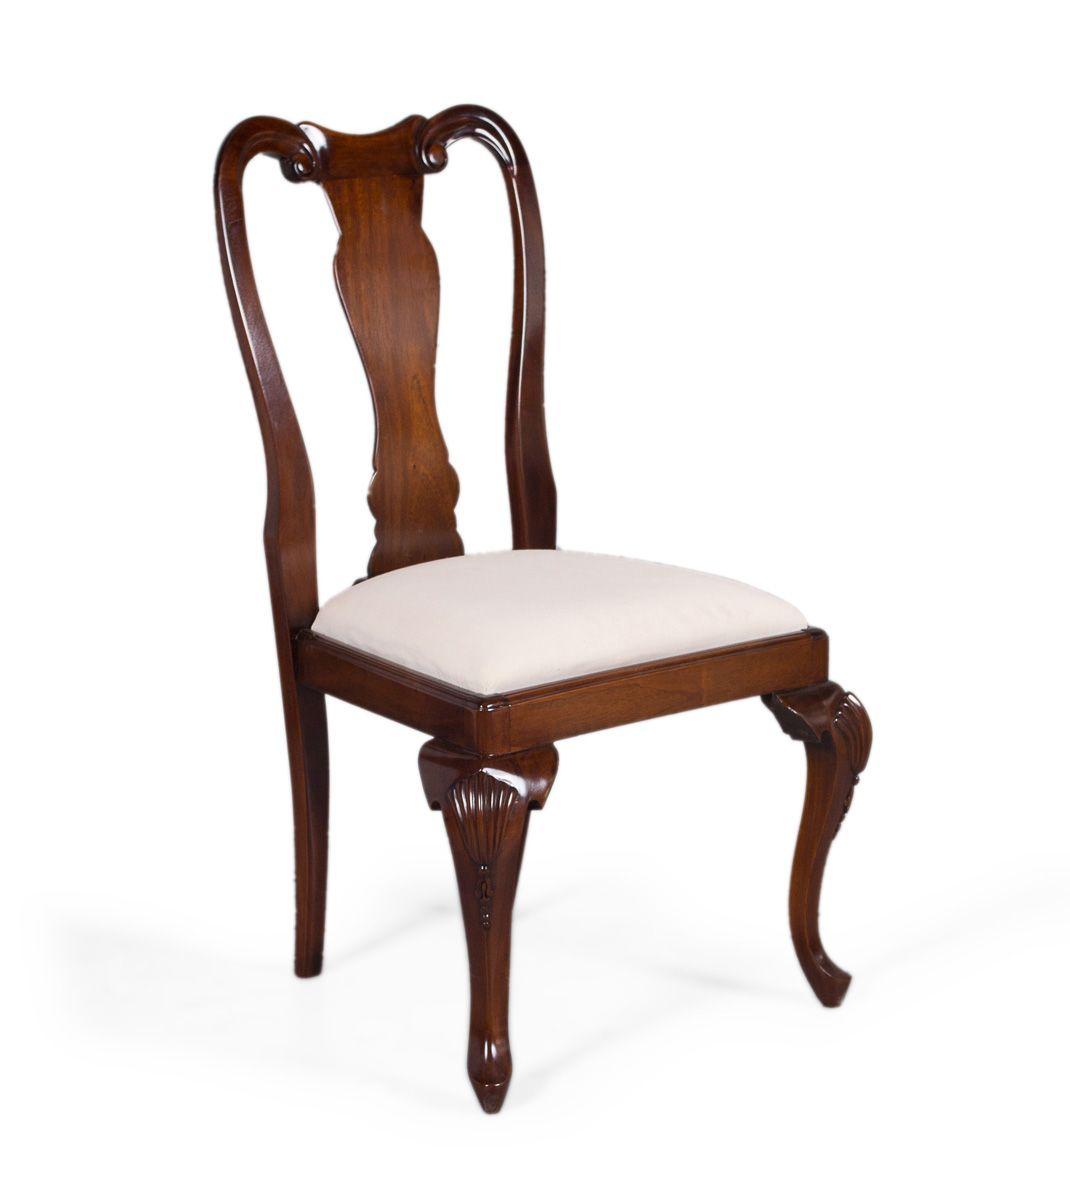 Silla reina ana history pinterest sillas reinas y barroco - Sillas estilo ingles ...